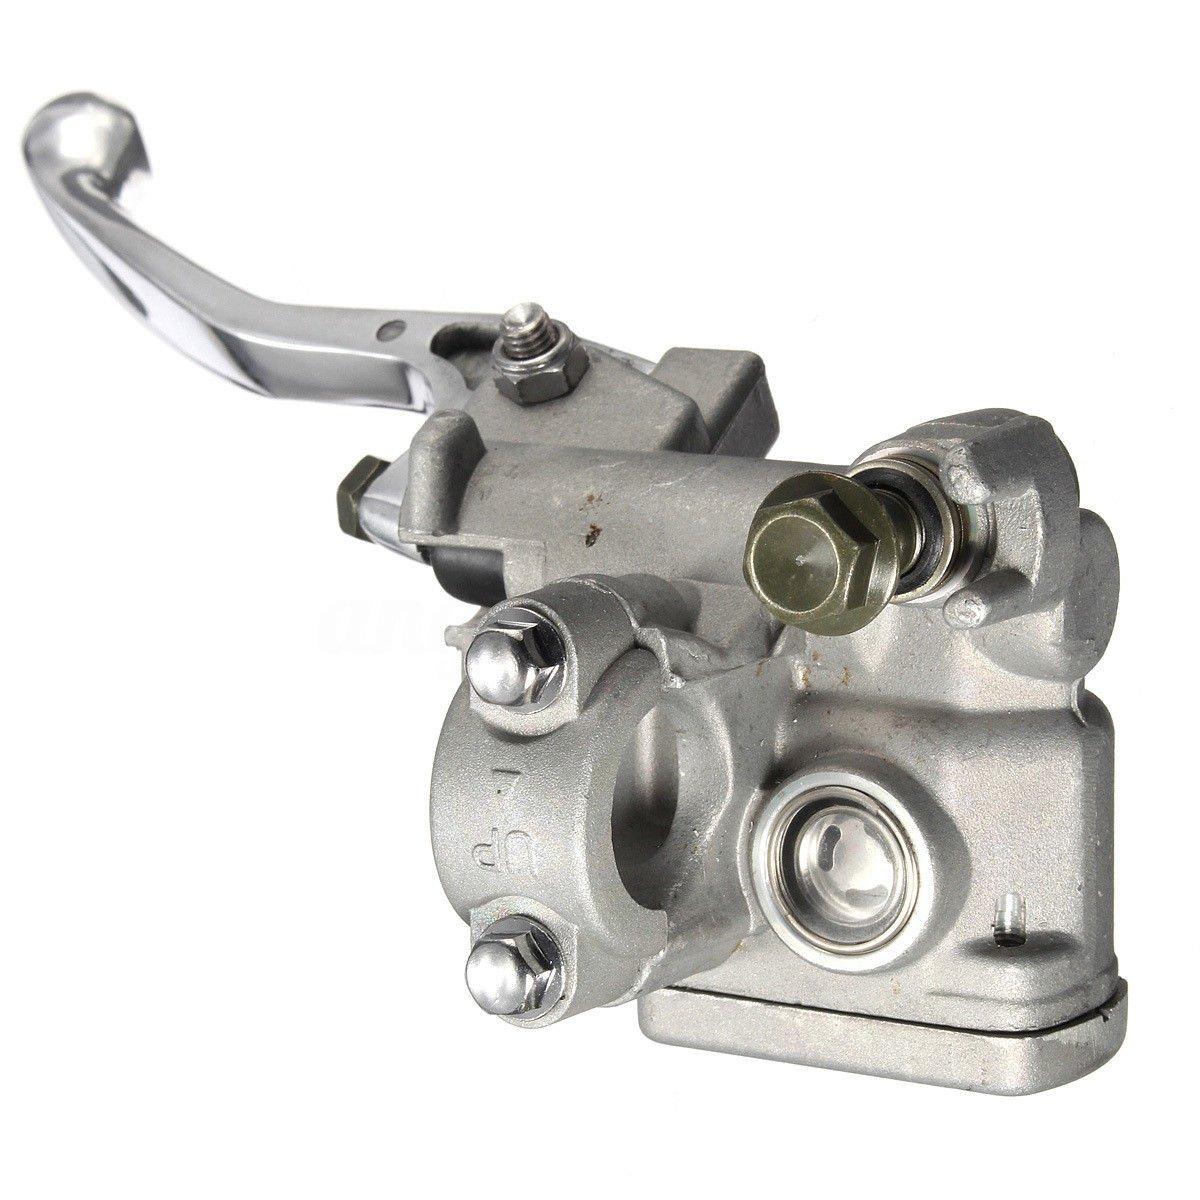 7//8 Right Front Brake Master Cylinder for Honda CR125R CR250R CR500R CRF250R CRF450R CRF250X CRF450X New